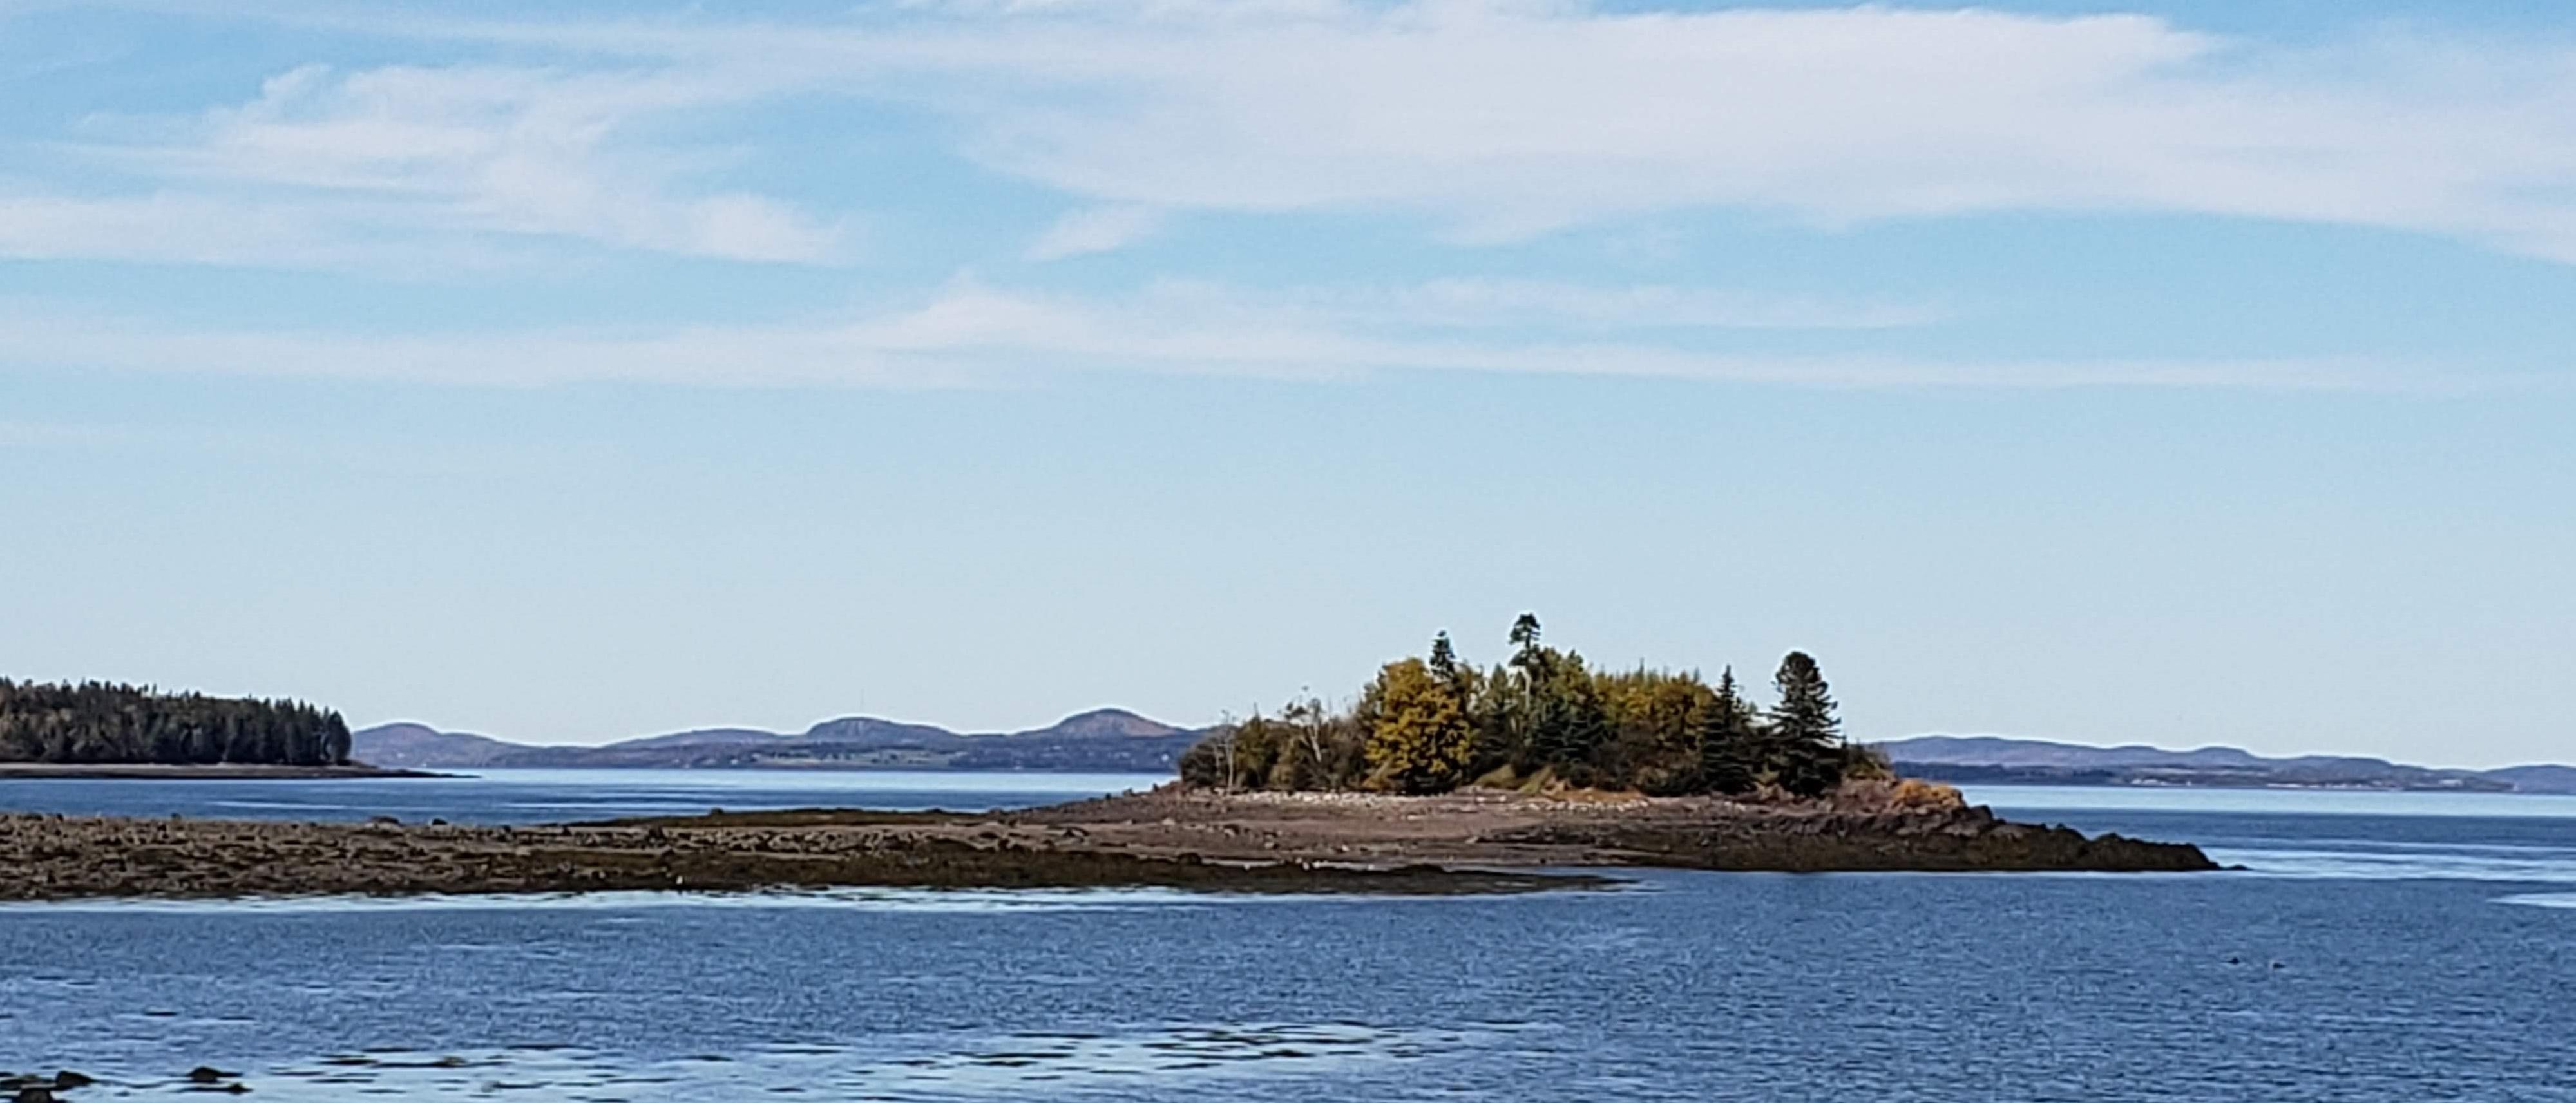 Sipayik Bay Second Island